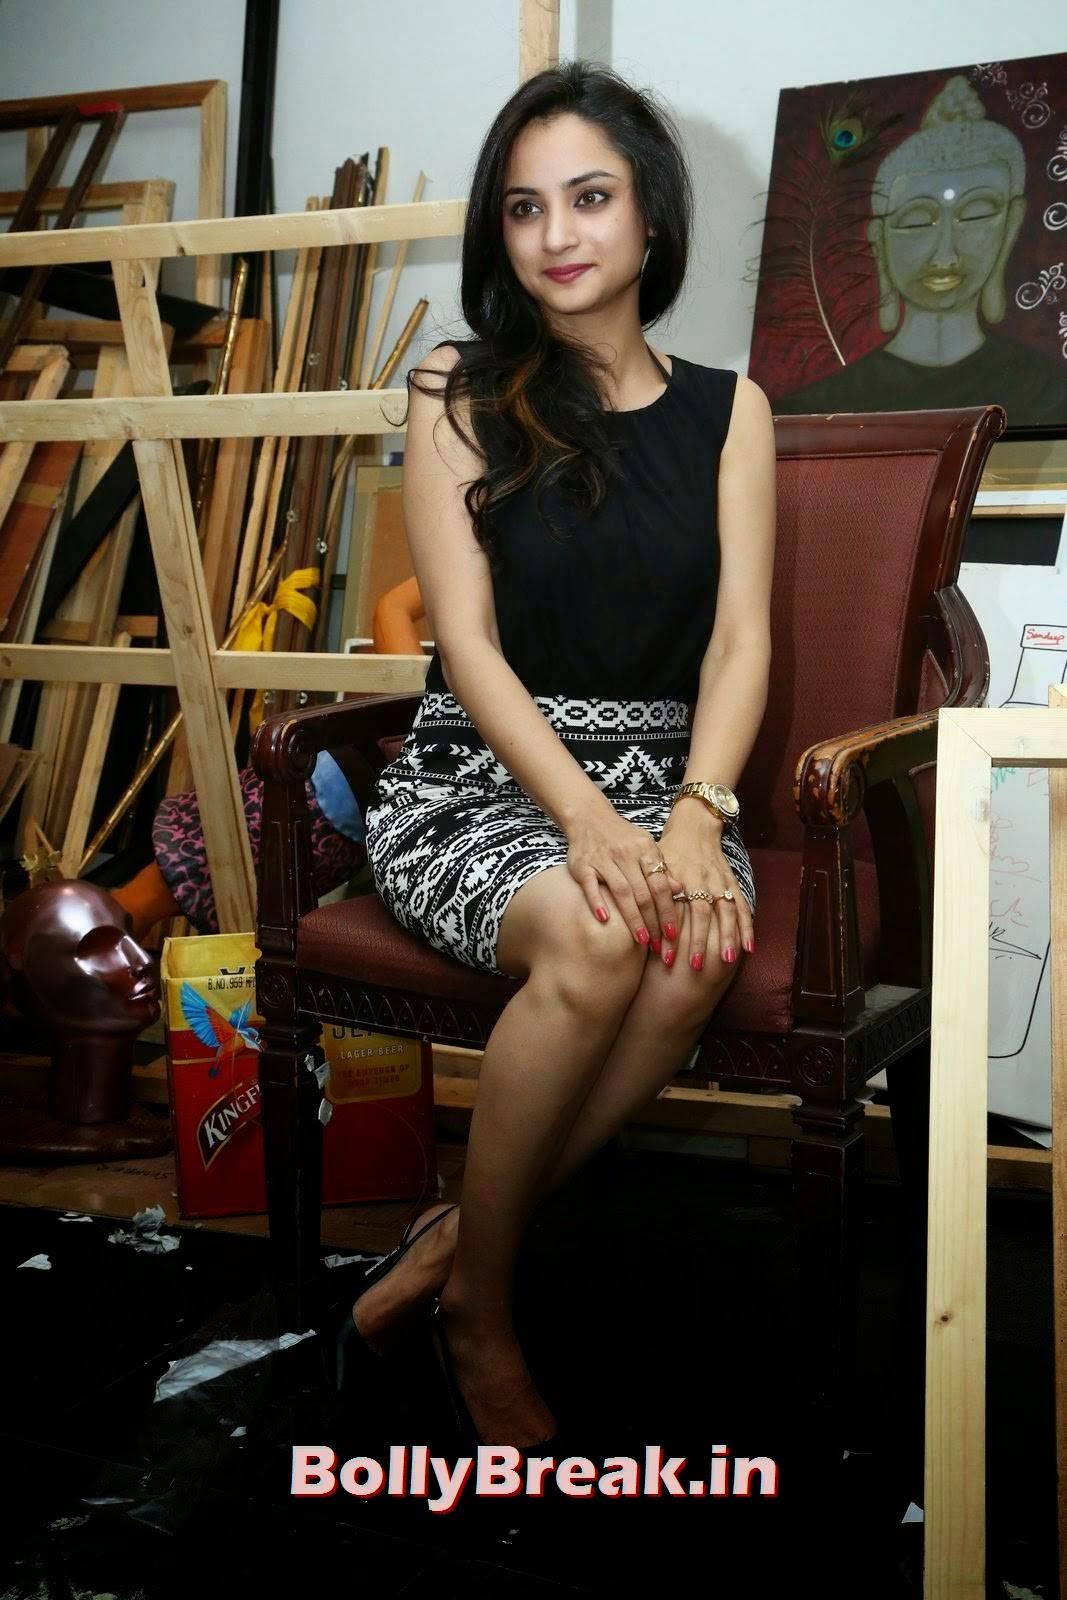 Actress Madirakshi Latest Stills, Actress Madirakshi Hot Pics in Skirt & Black Top